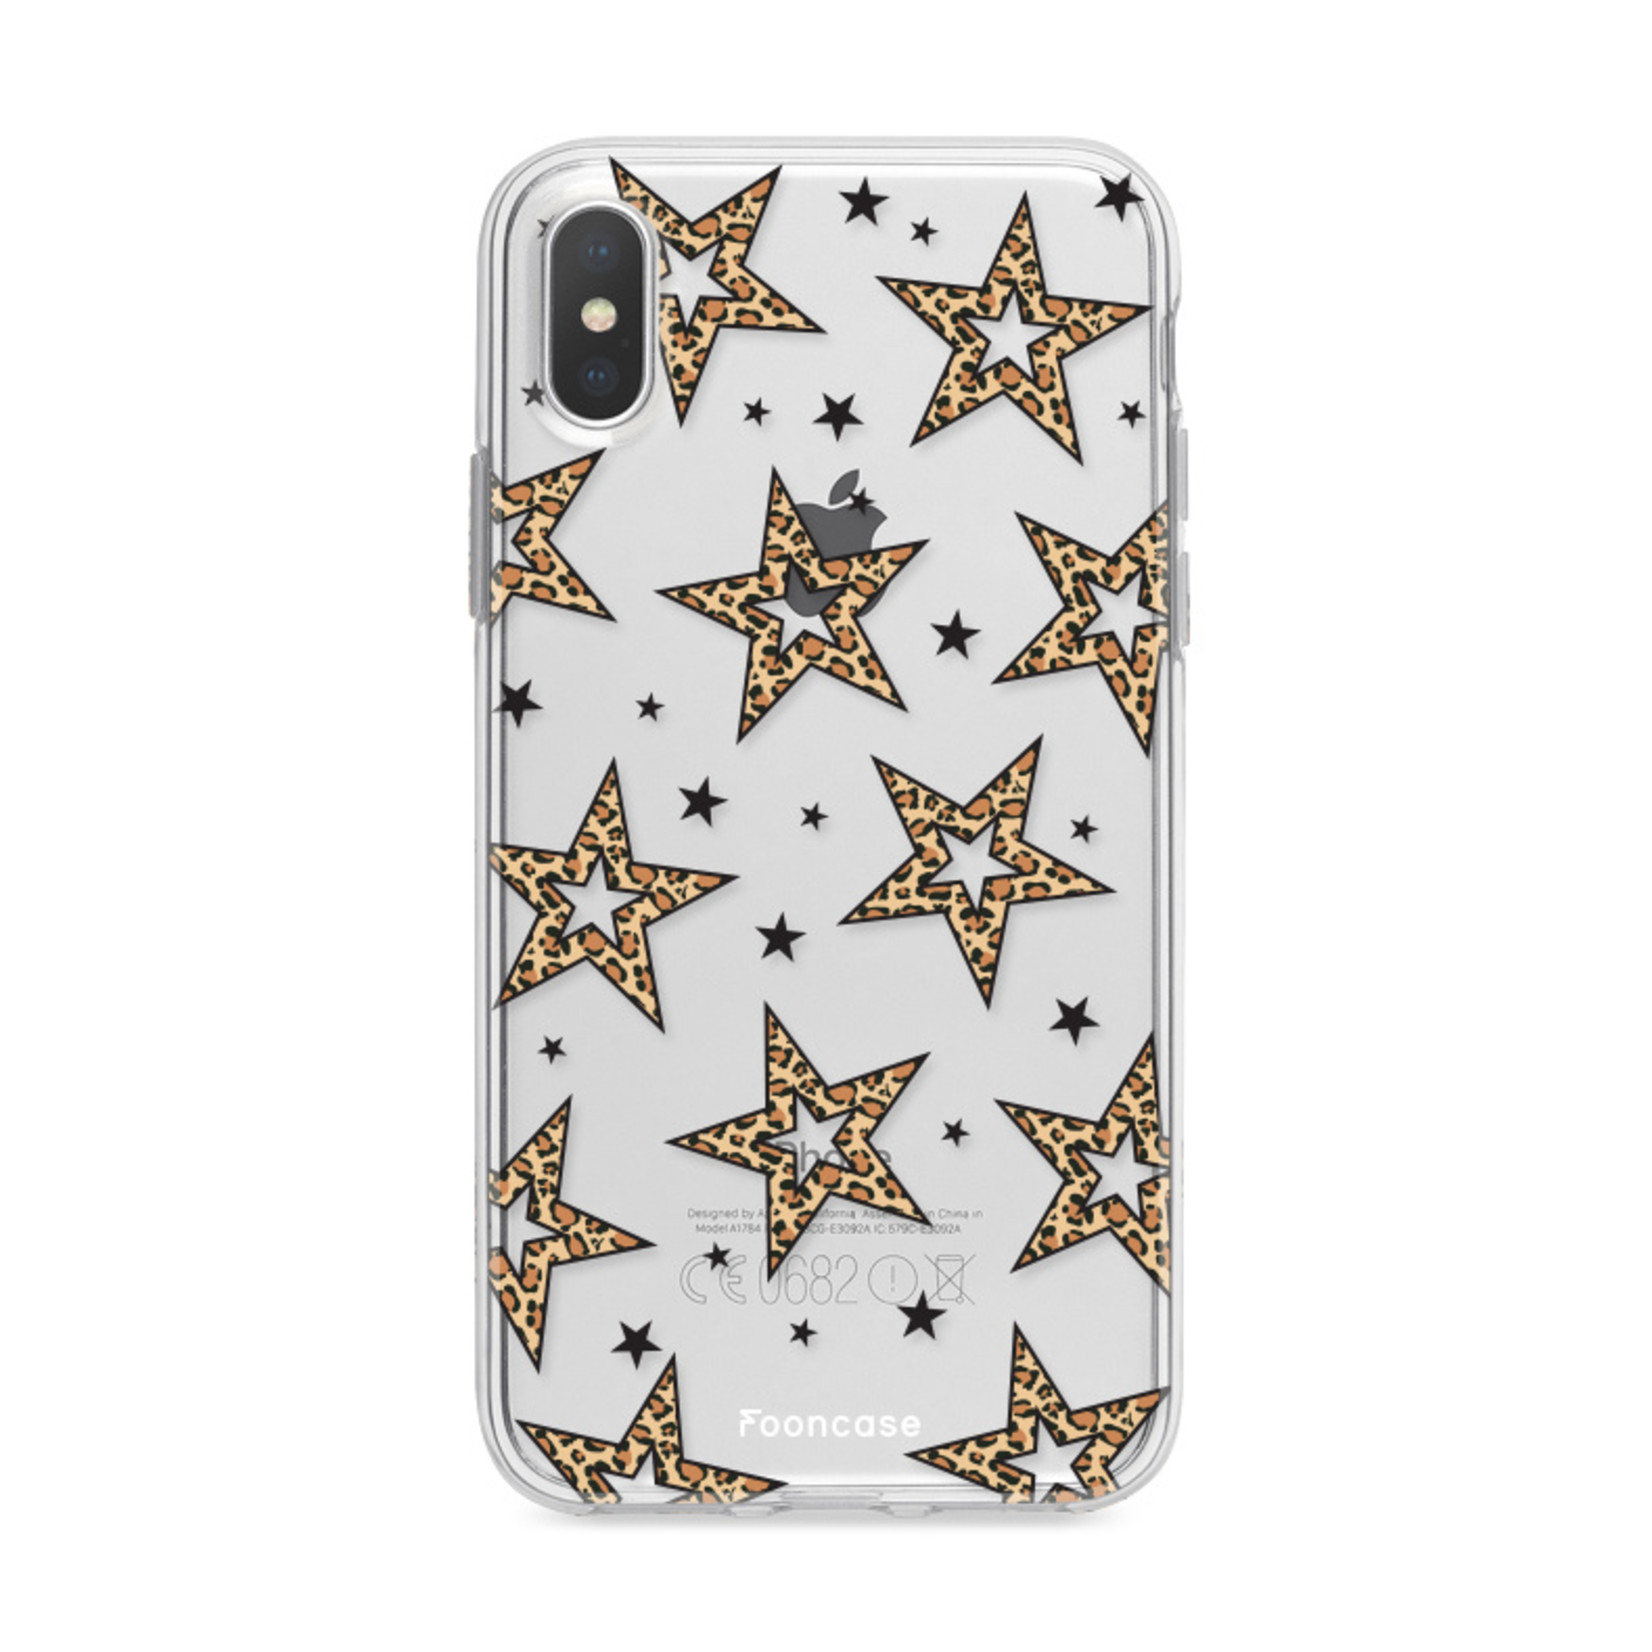 iPhone XS hoesje TPU Soft Case - Back Cover - Rebell Leopard Sterren Transparant